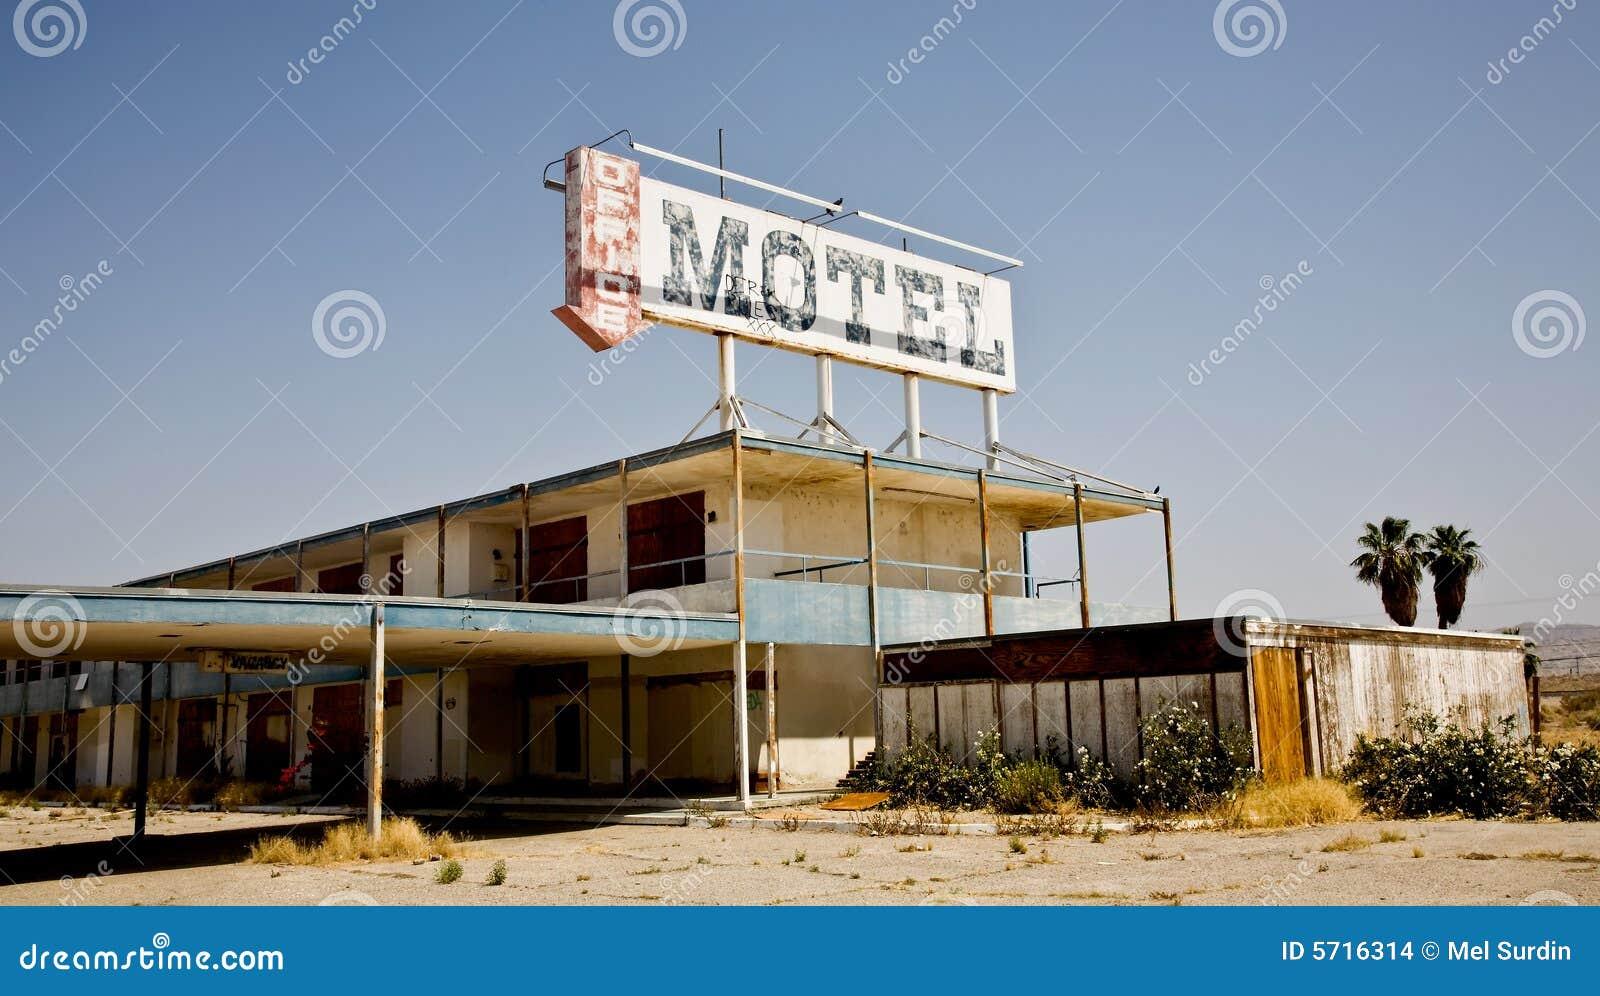 Hotels Motels Nevada City Ca